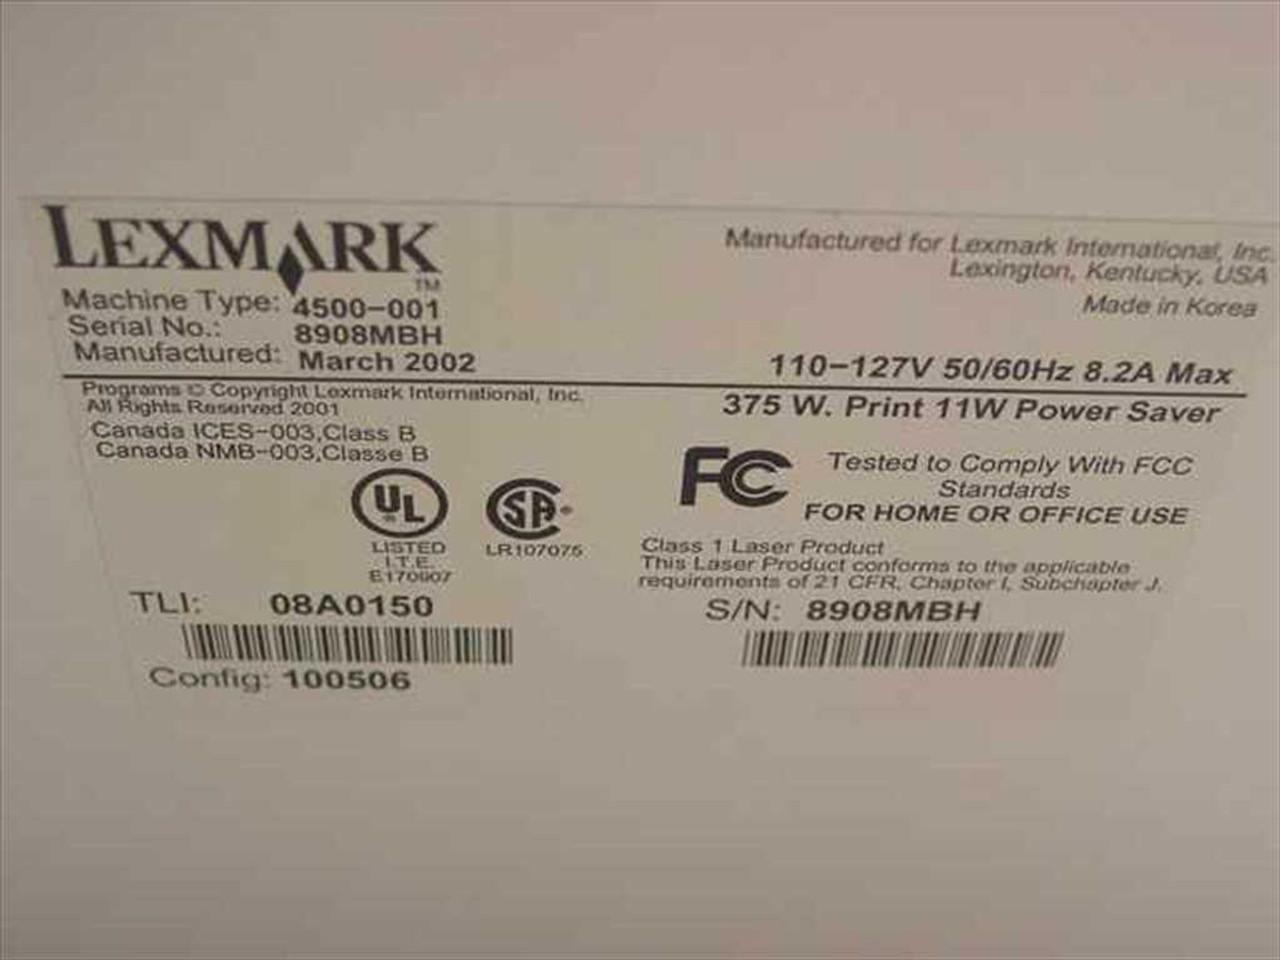 Lexmark 4500-001 Laser Printer E320 New in Box no Toner